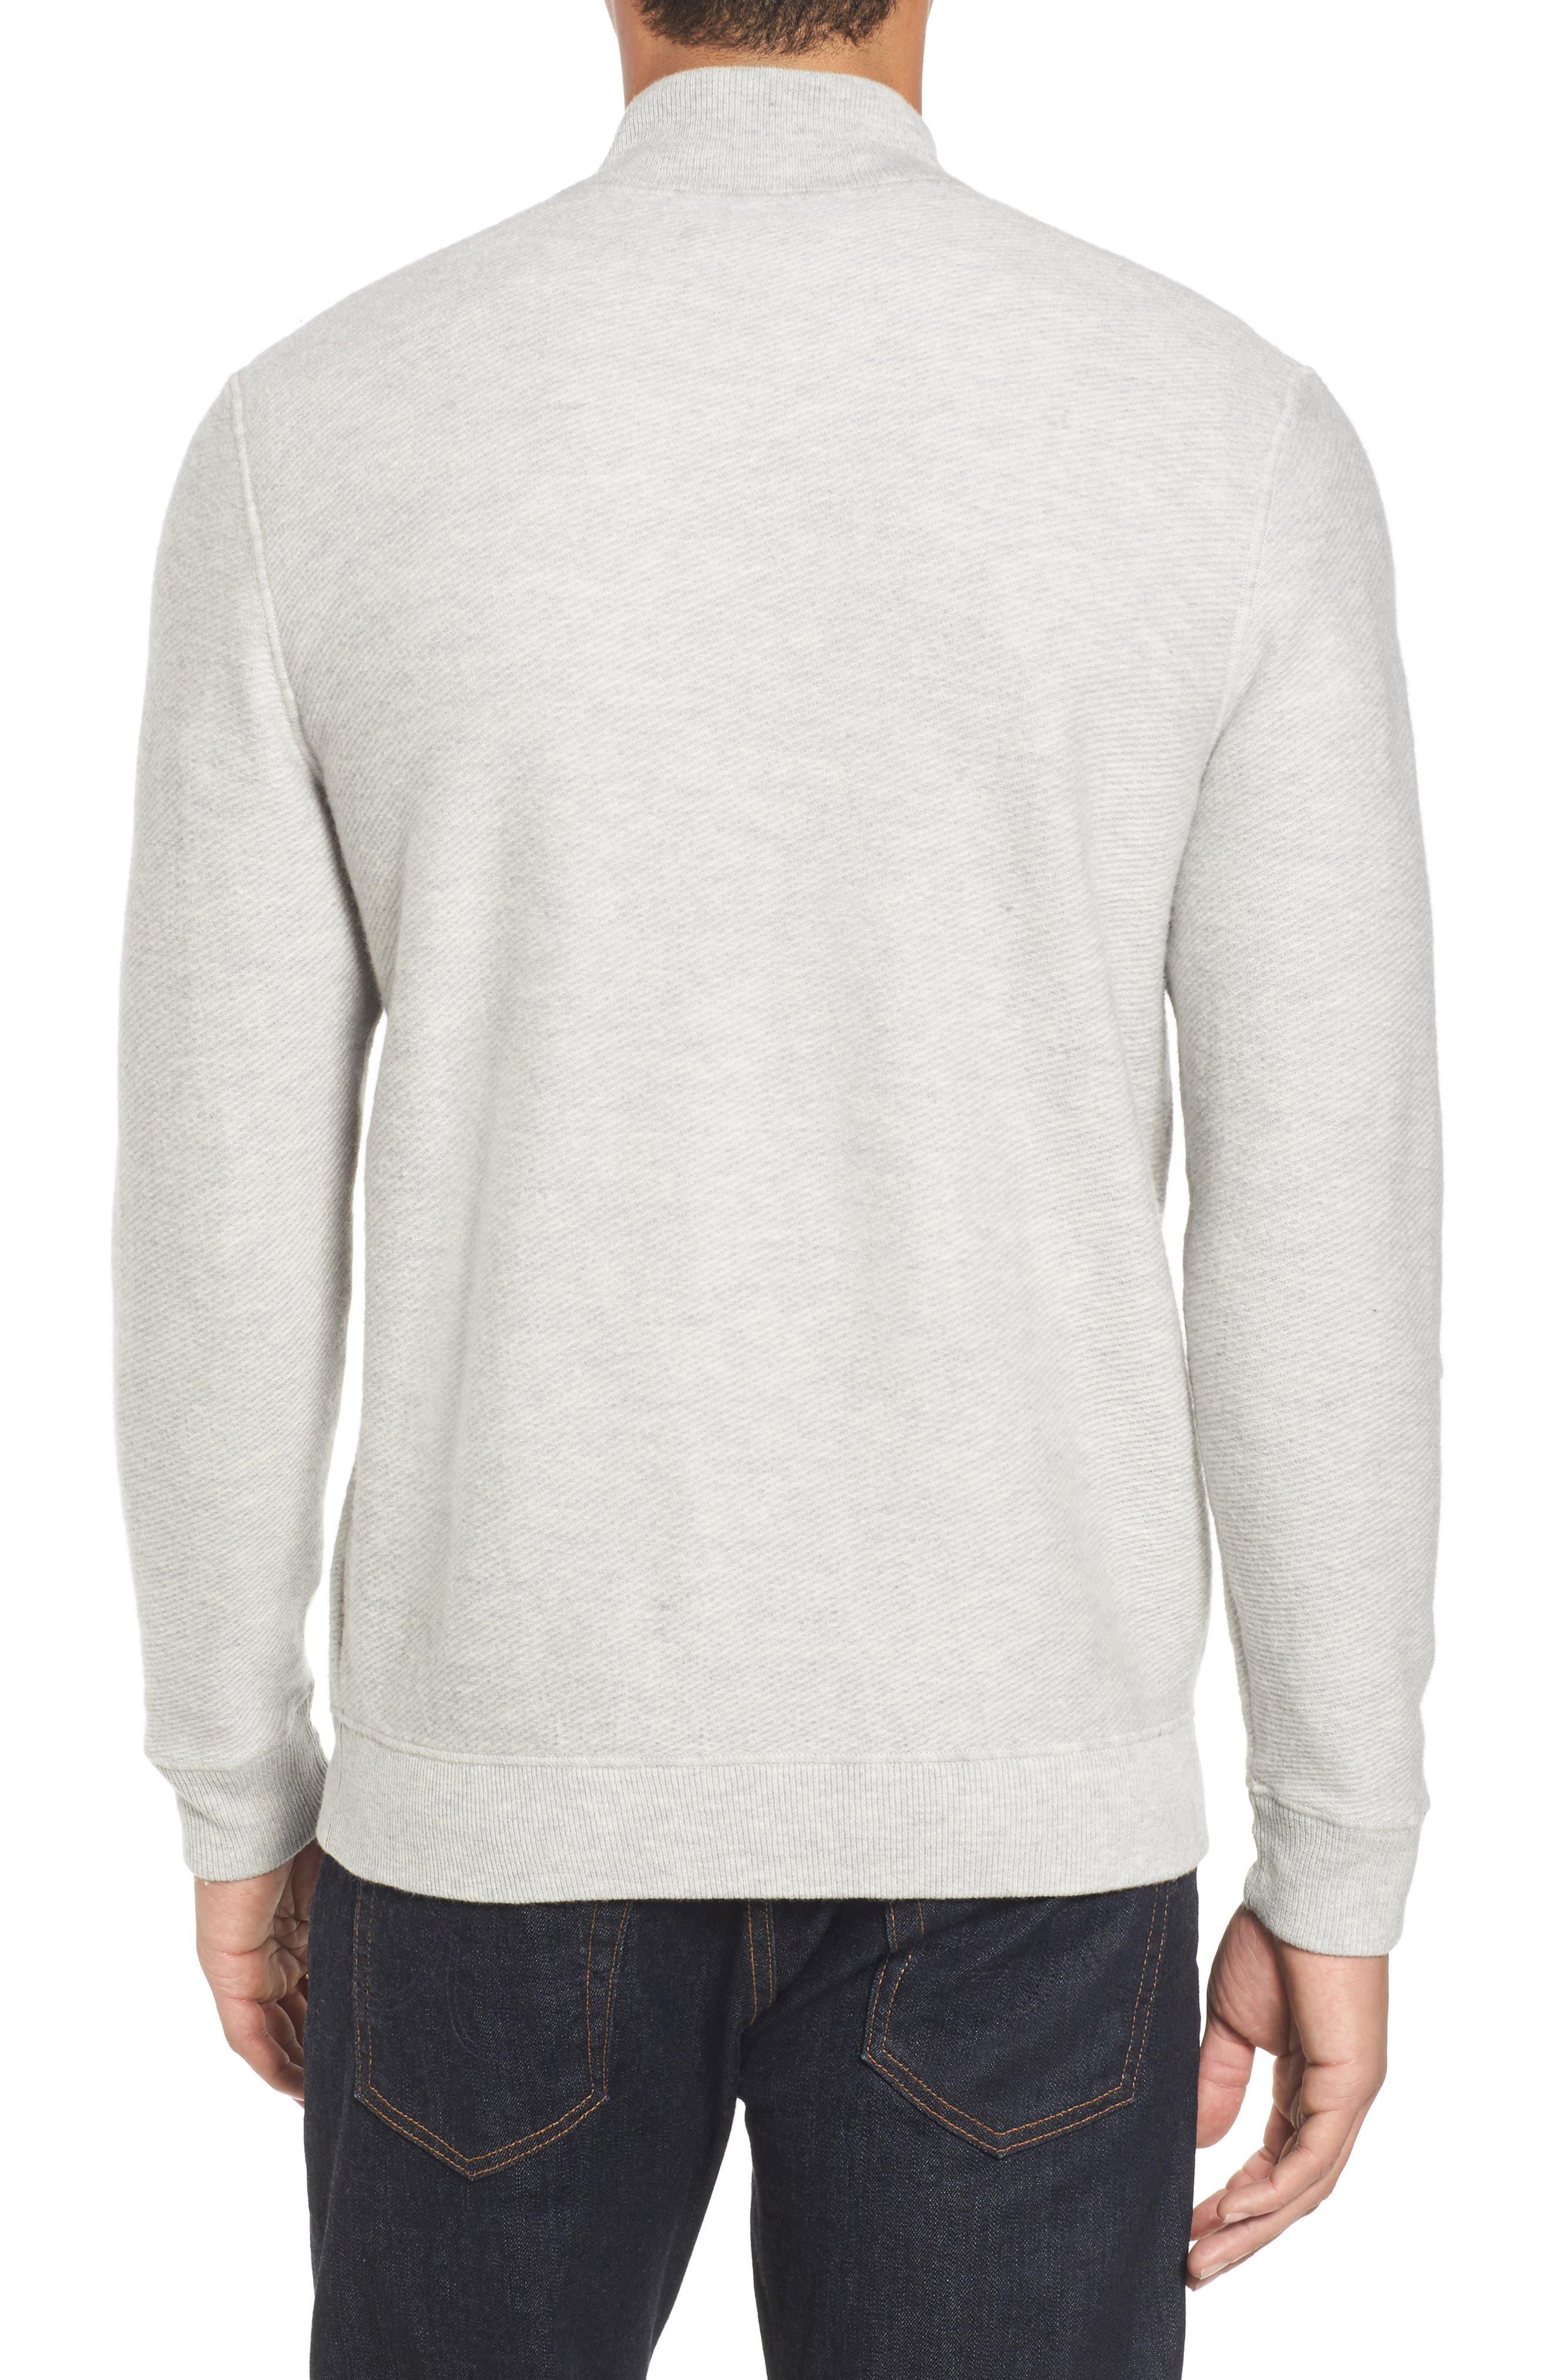 Merino Wool Twill Stitch Quarter Zip Sweater,                             Alternate thumbnail 2, color,                             039